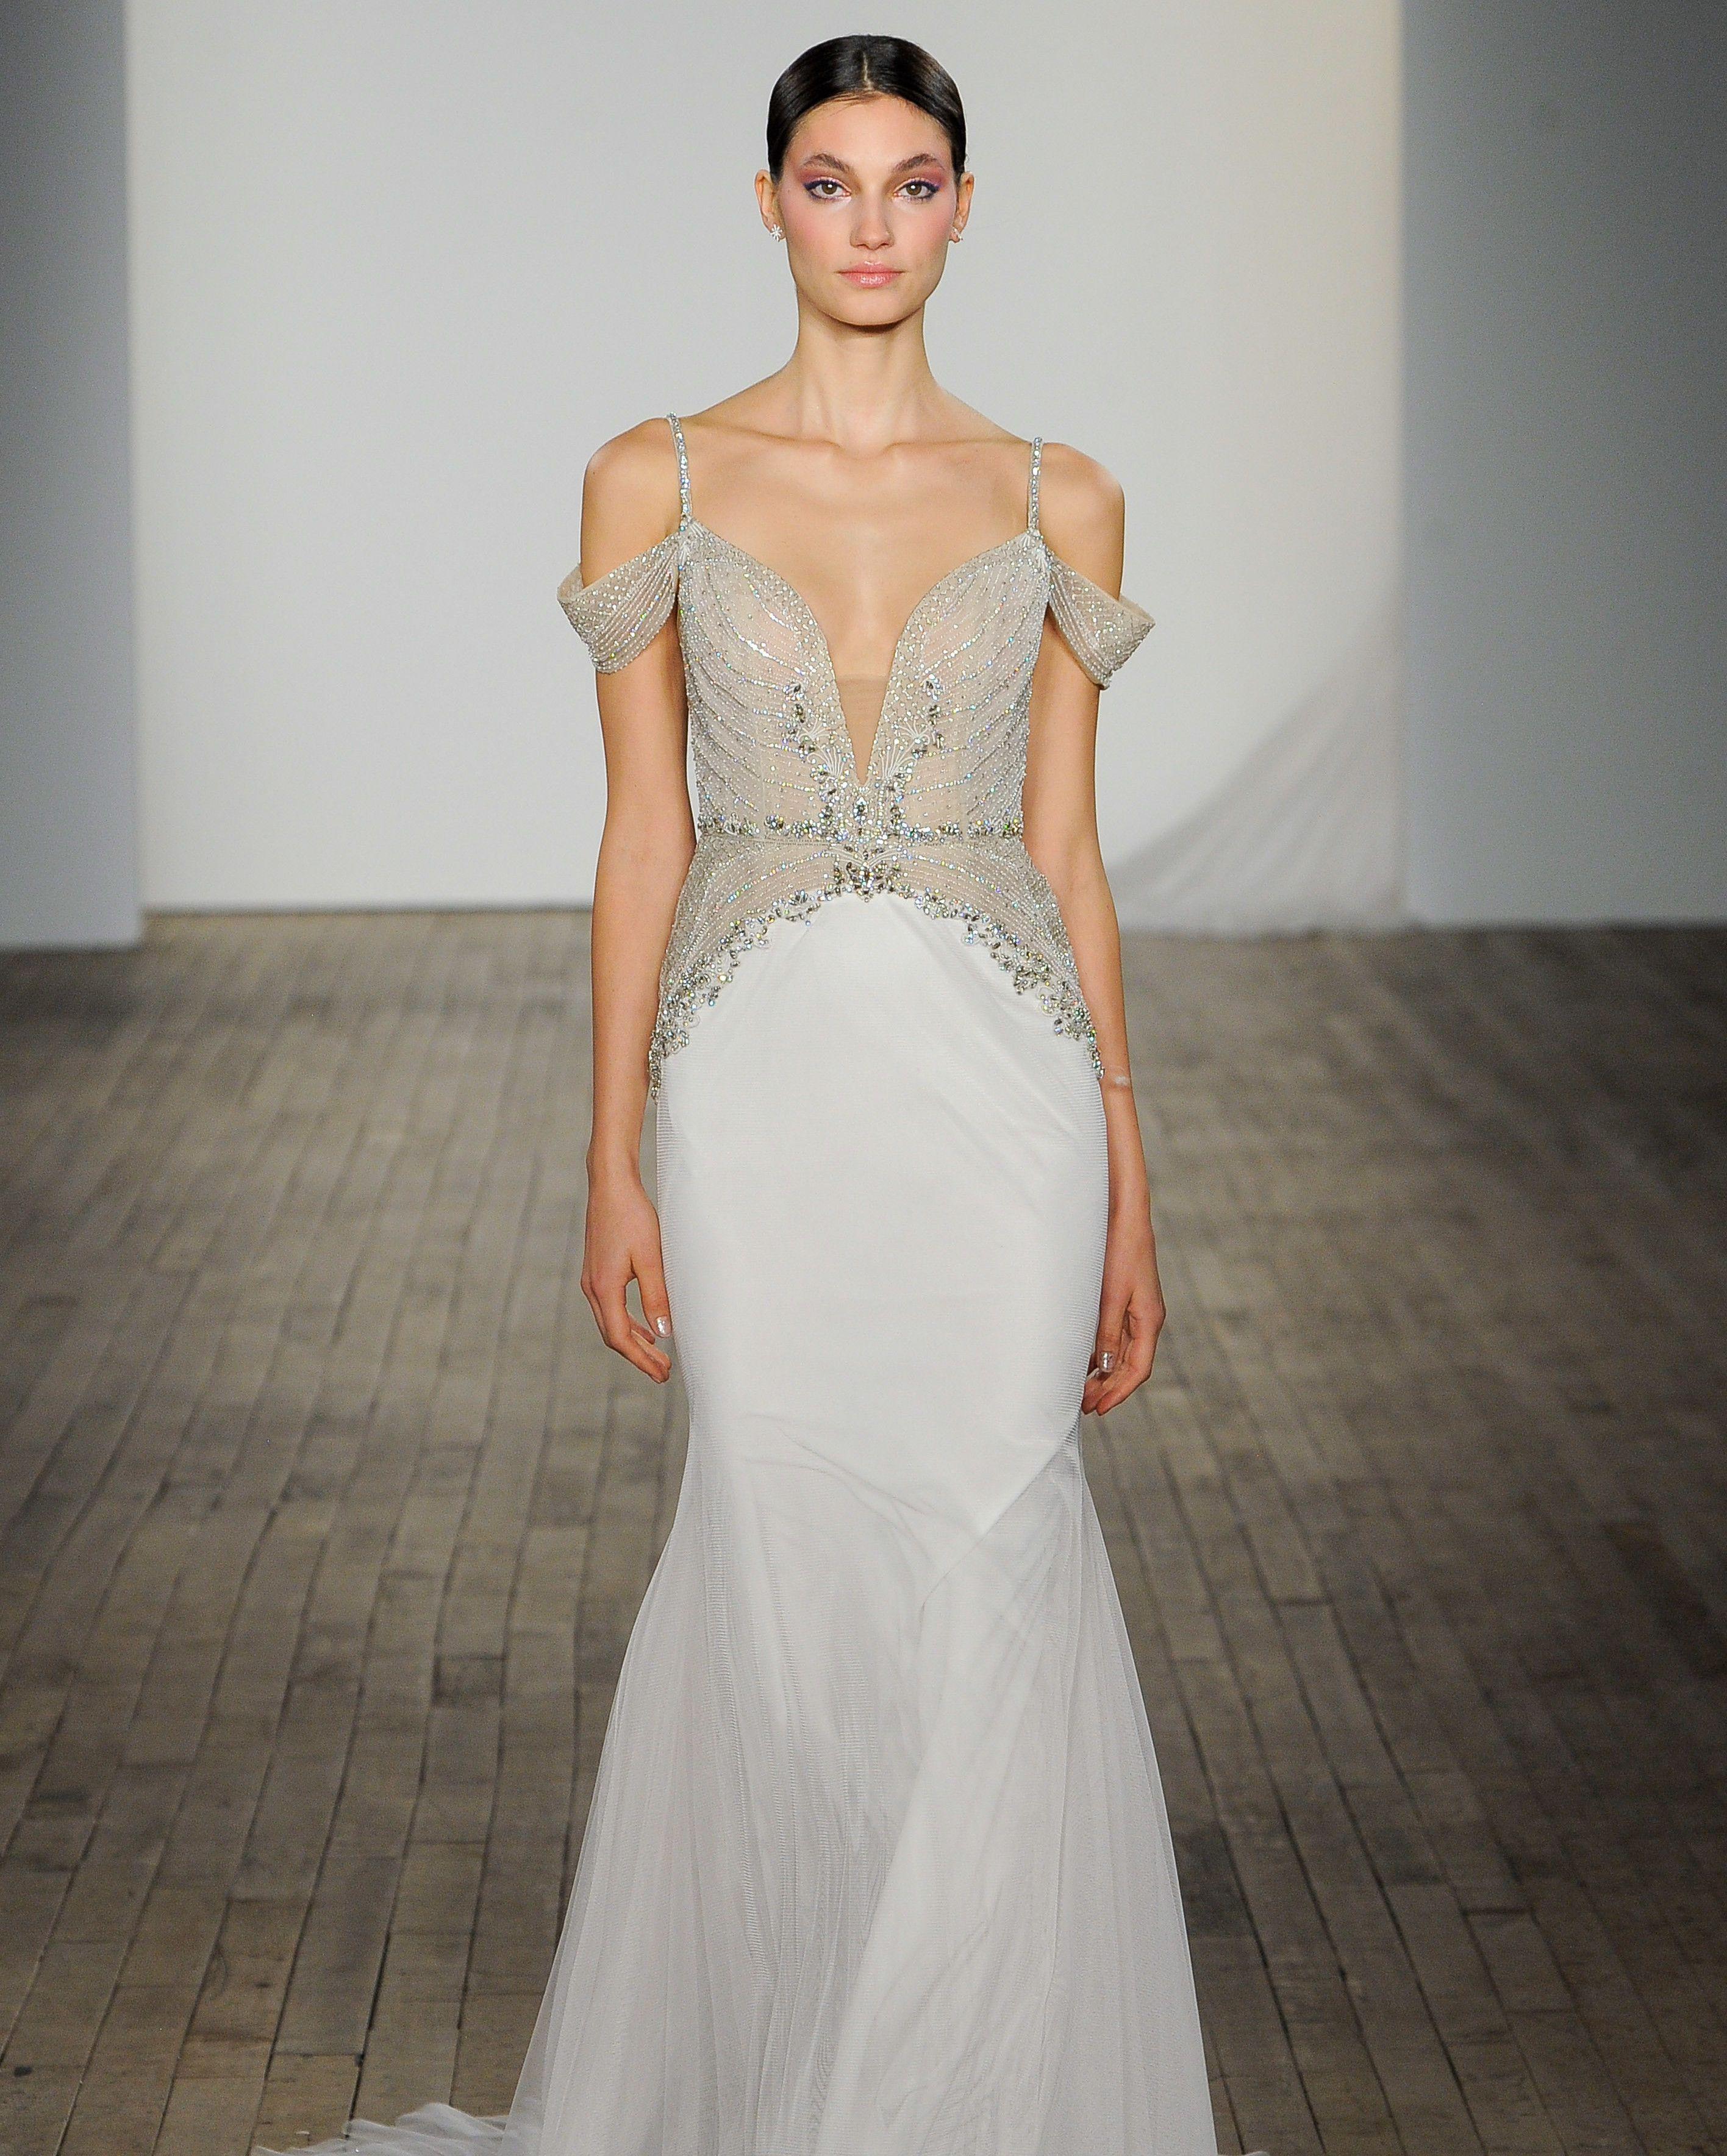 Mod wedding dress  Hayley Paige Fall  Wedding Dress Collection  Bridal Fashion